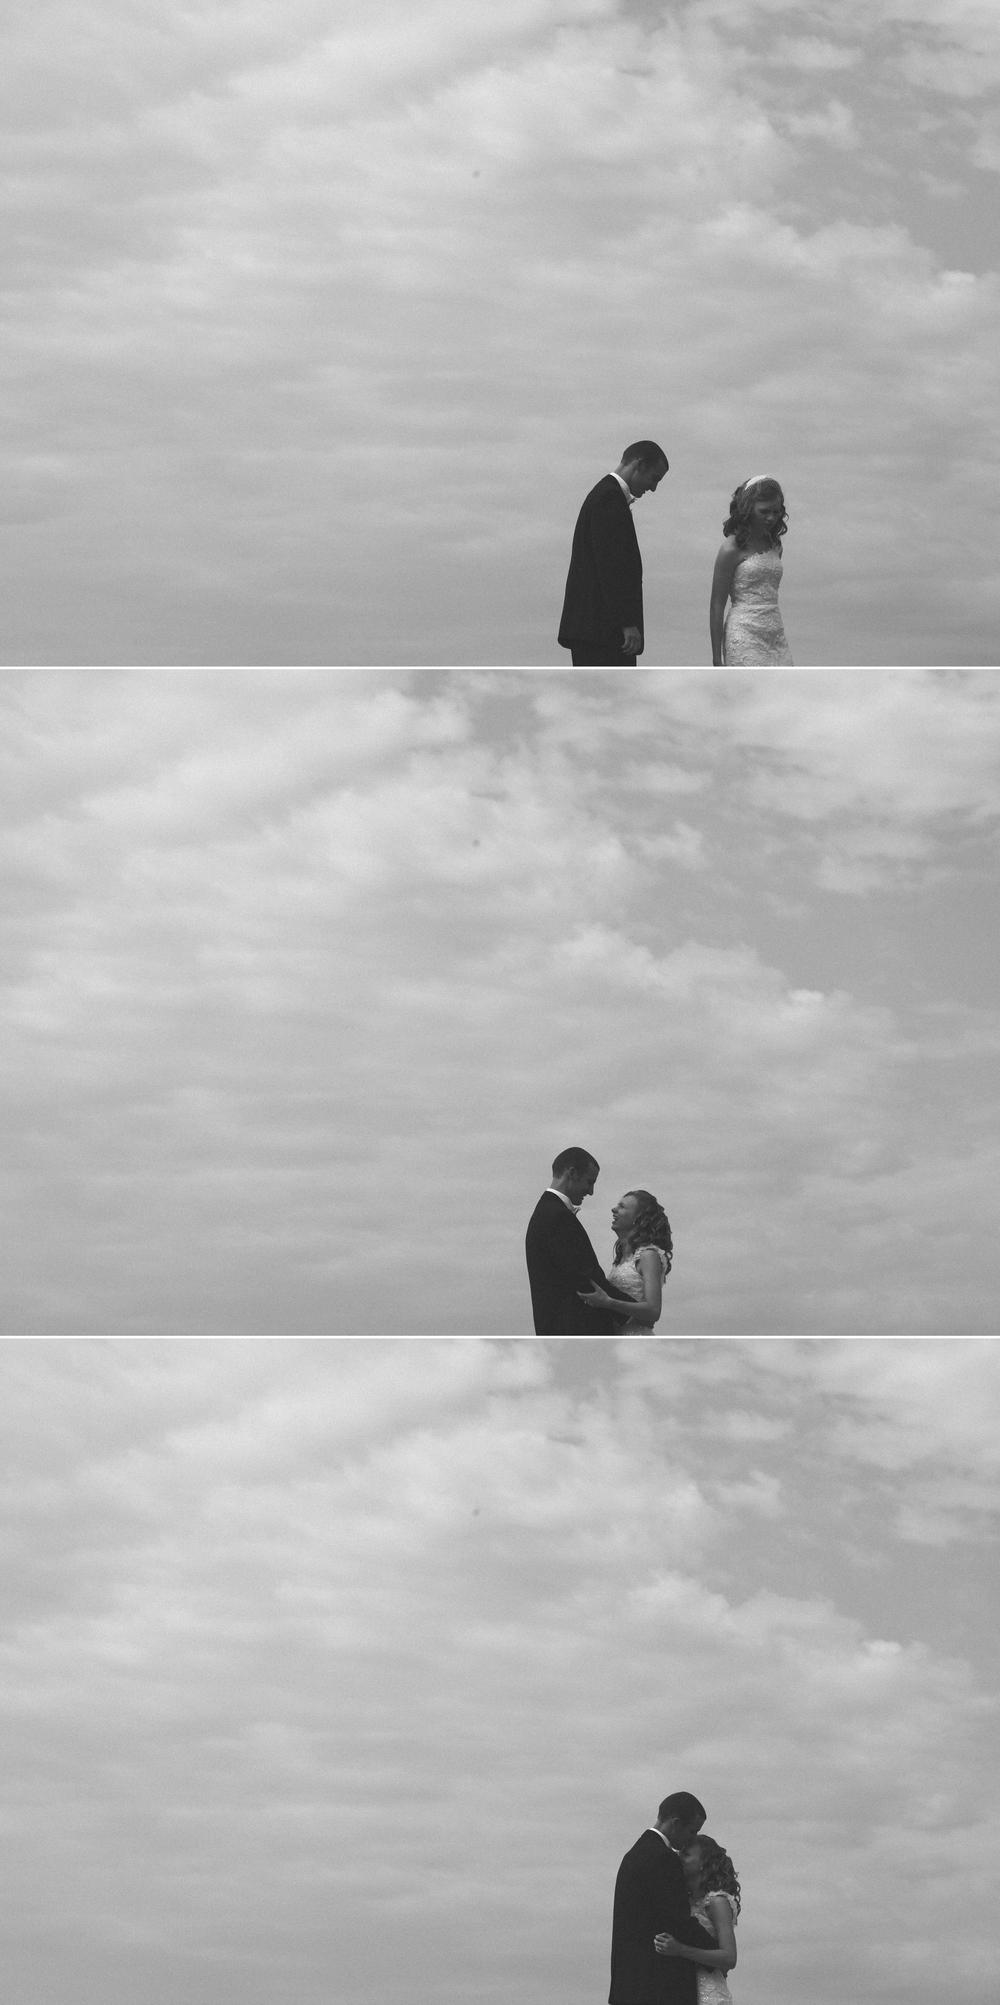 albrica_tierra_atlanta_wedding_photographer_photography_02 copy.jpg